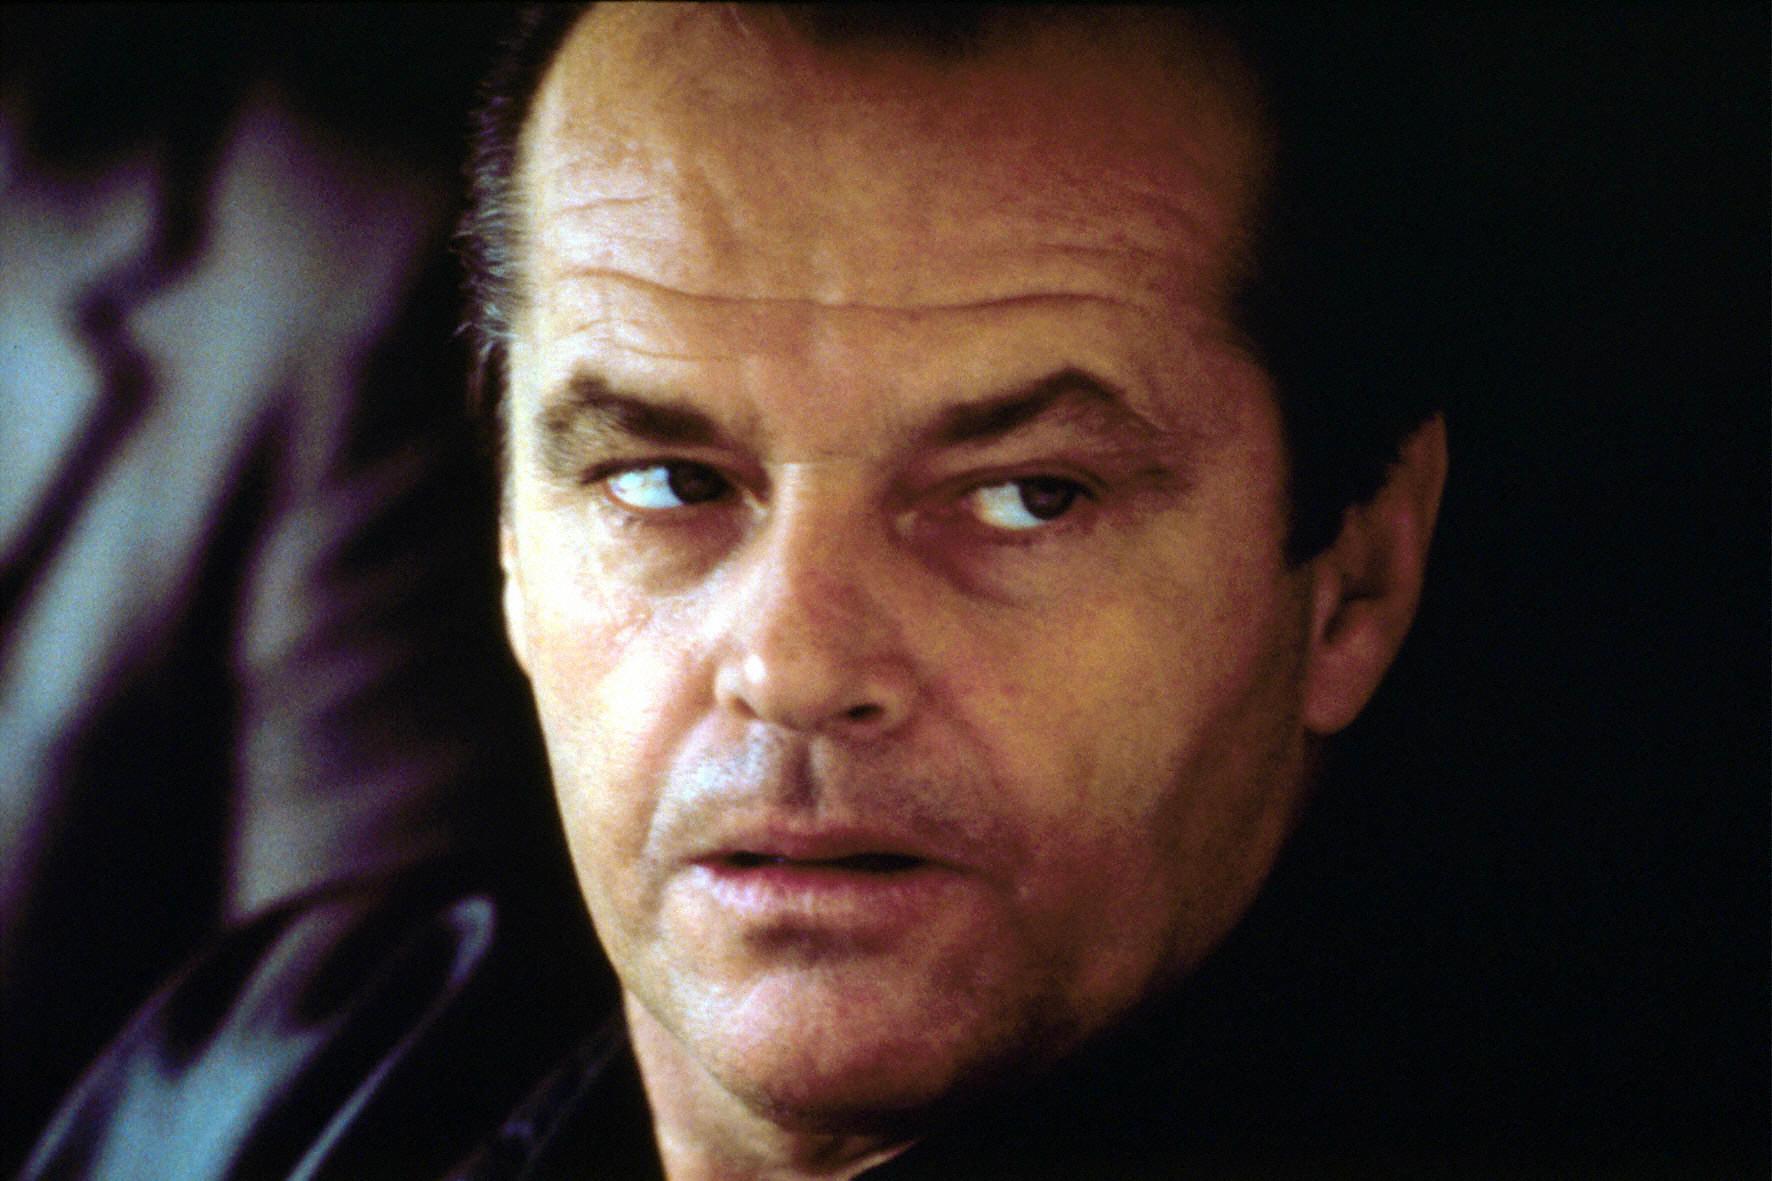 Jack Nicholson Images Prizzi 39 S Honor 1985 Wallpaper